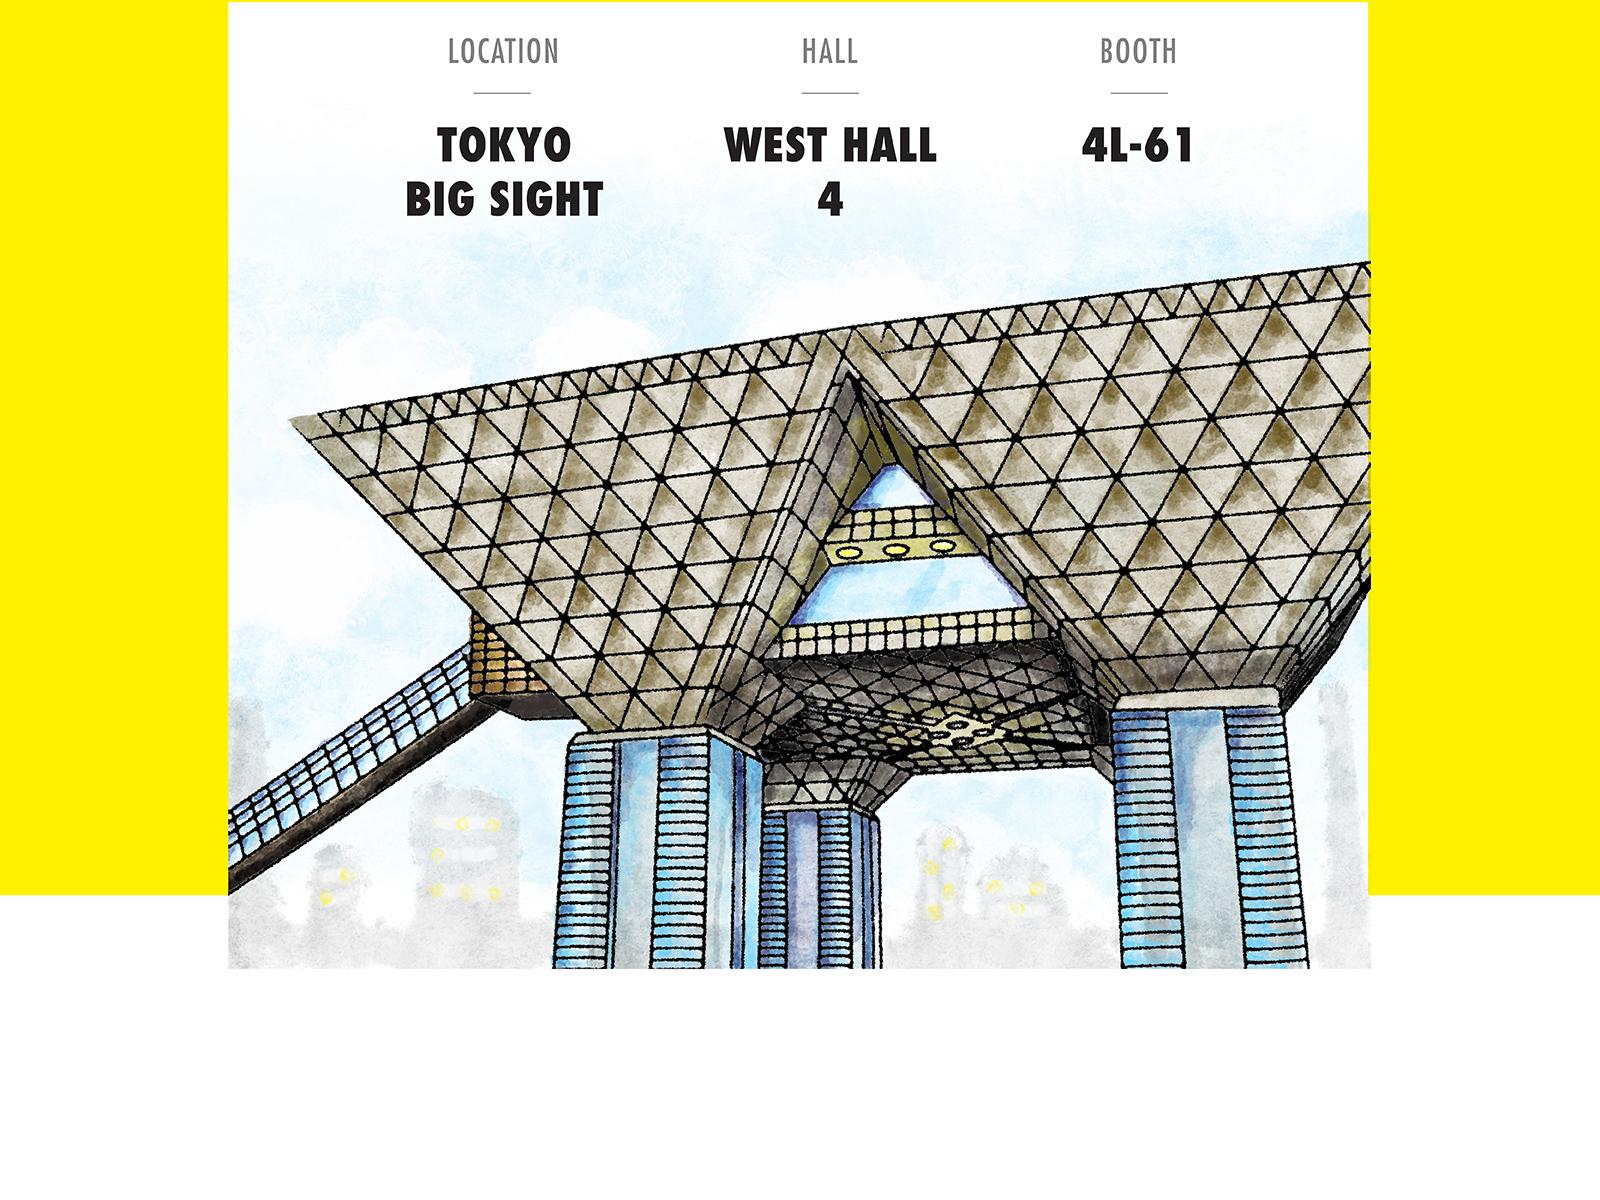 Y2S Wellness social media management post illustration of Big Sight in Tokyo, Japan